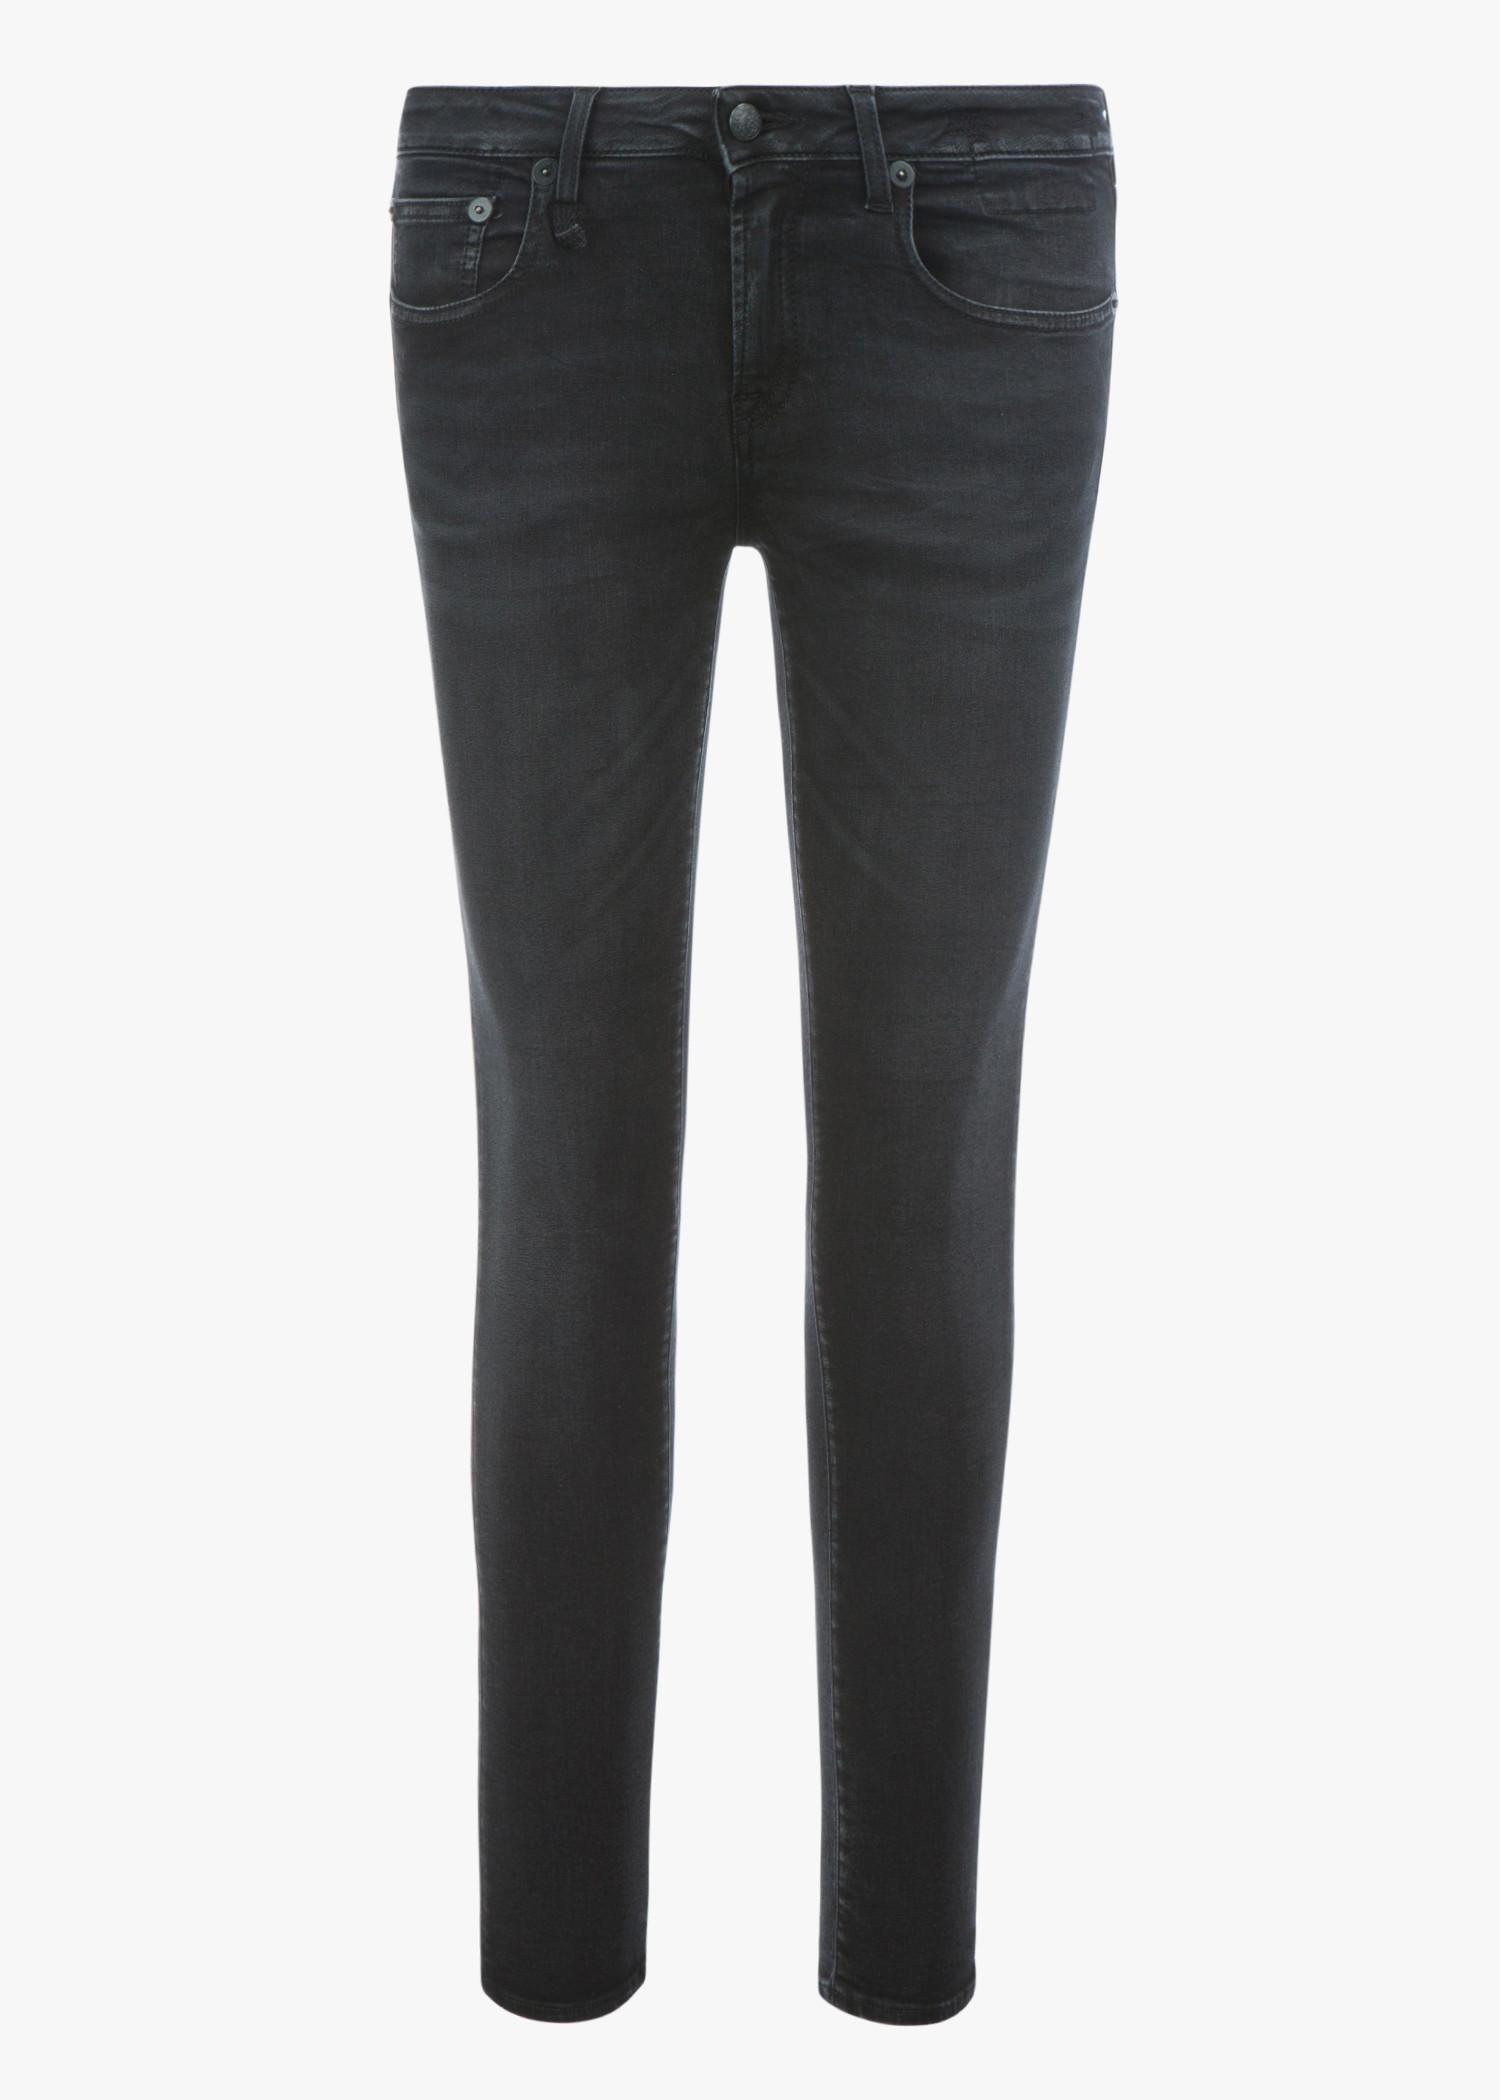 R13 Kate Skinny Jeans In Dark Moon With Angled Hem